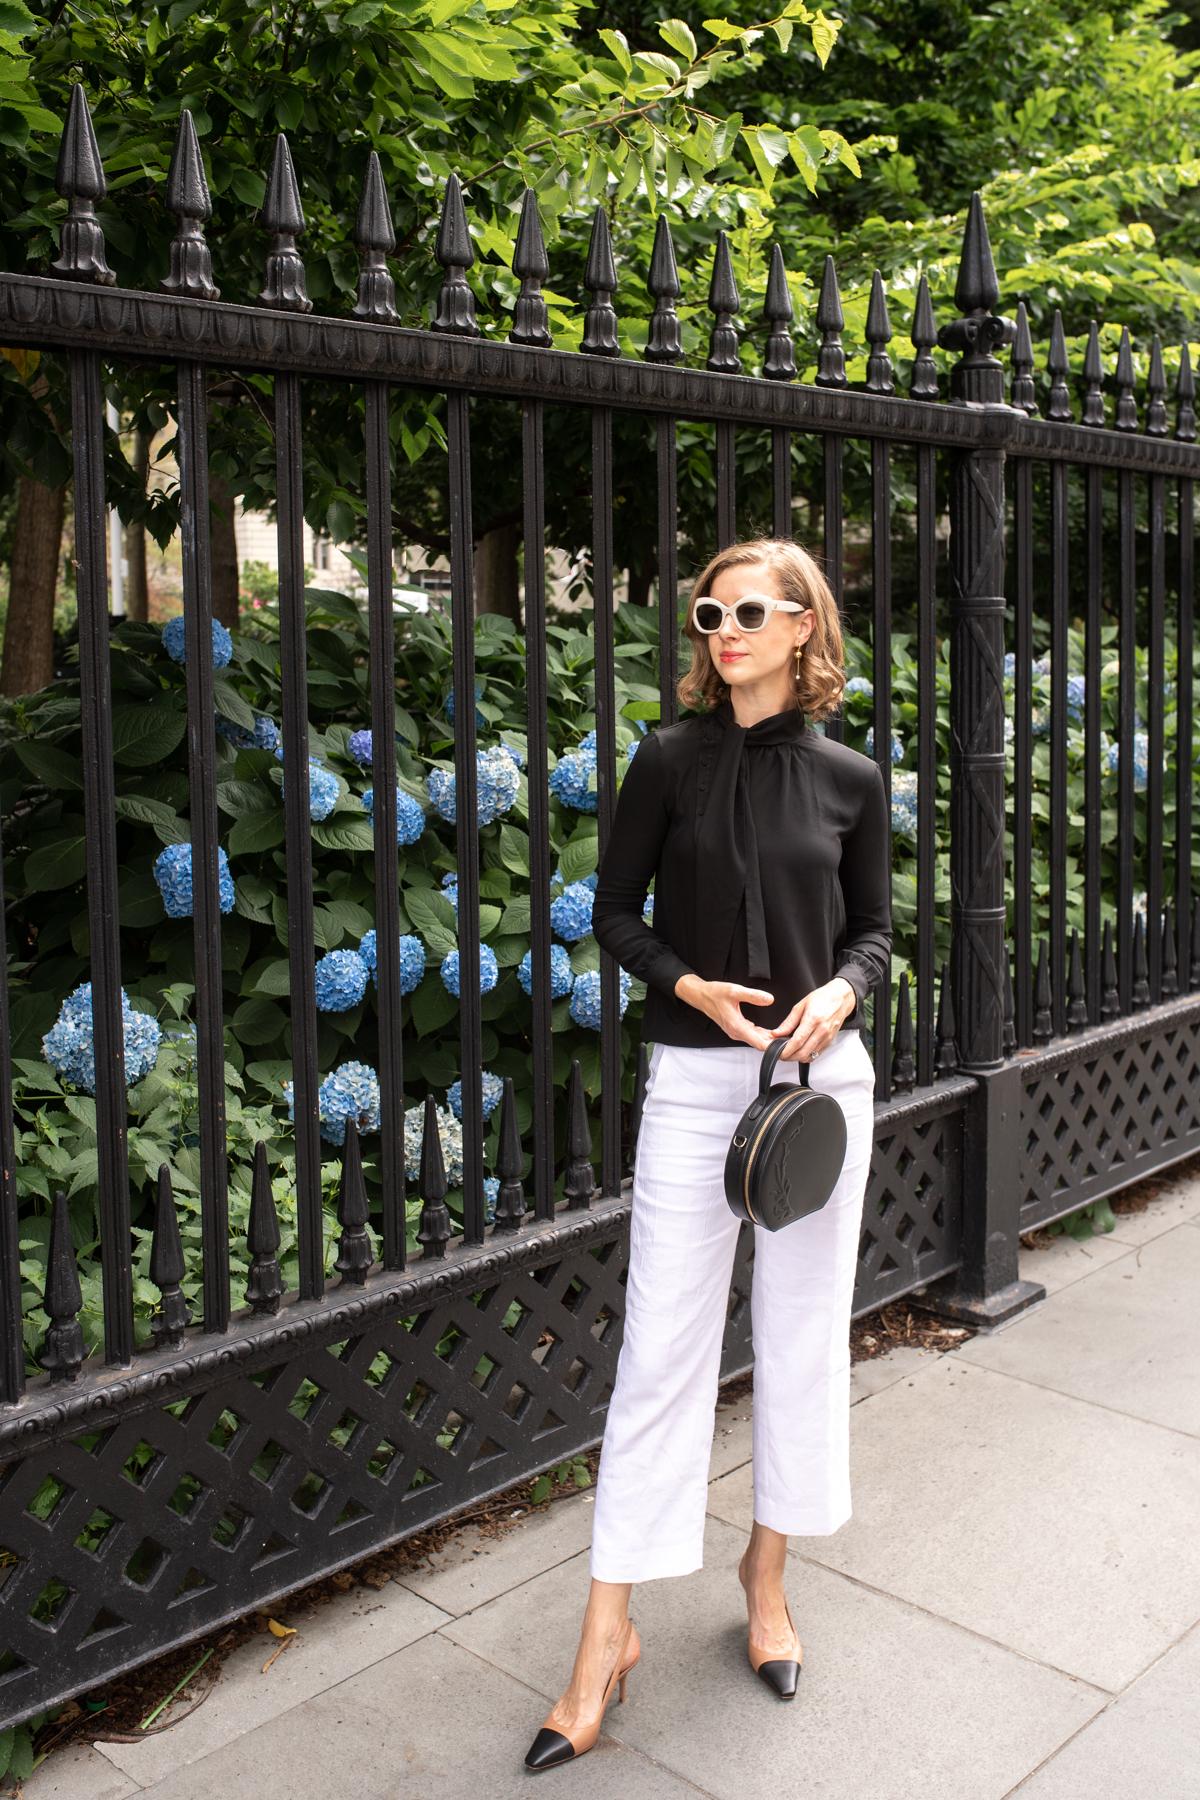 Stacie Flinner x Tell No Leyes Bag-1.jpg